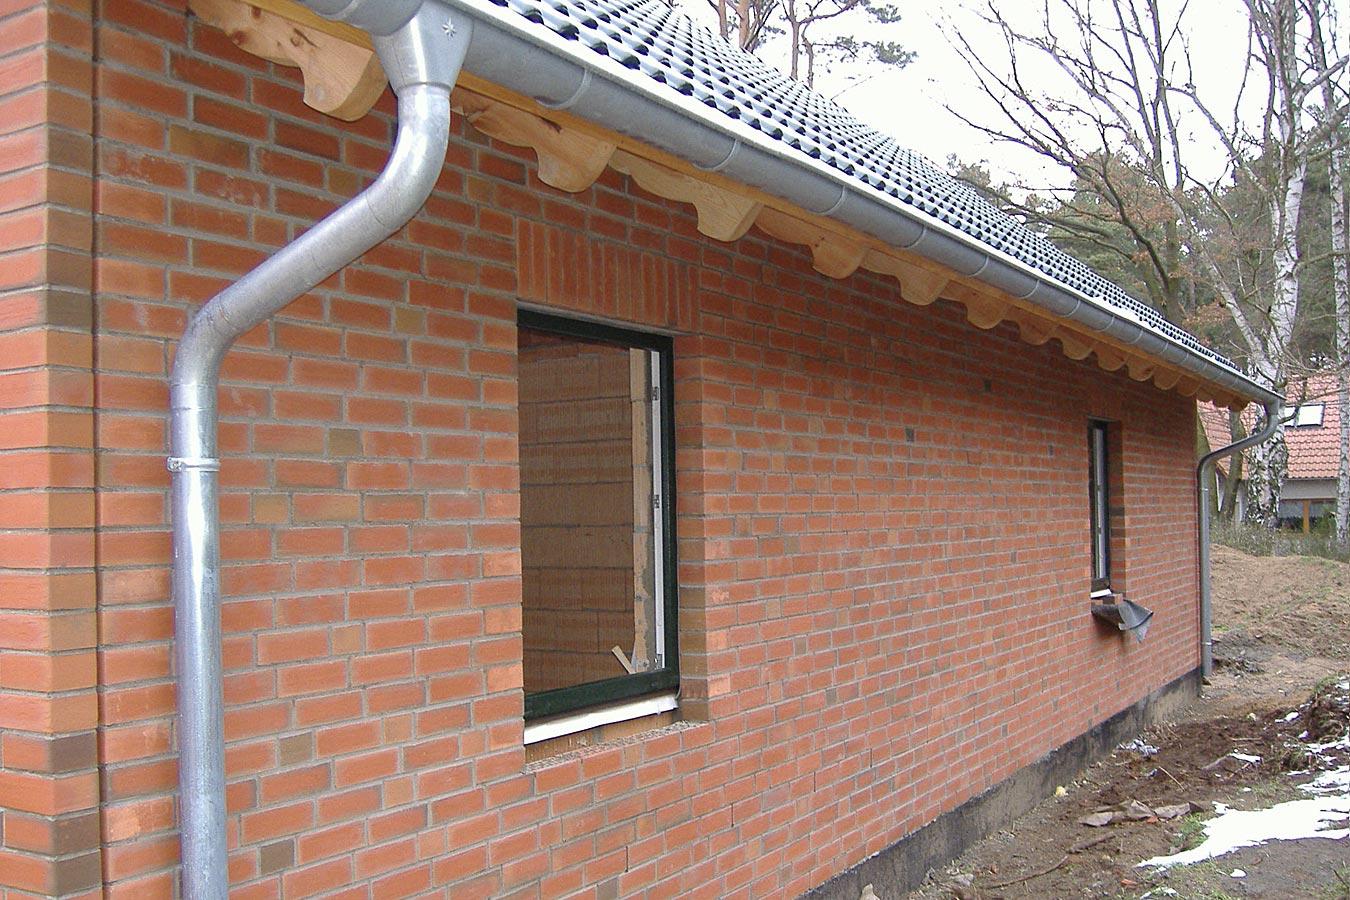 Baustellenimpressionen willkommen bei der templiner for Fenster ytong